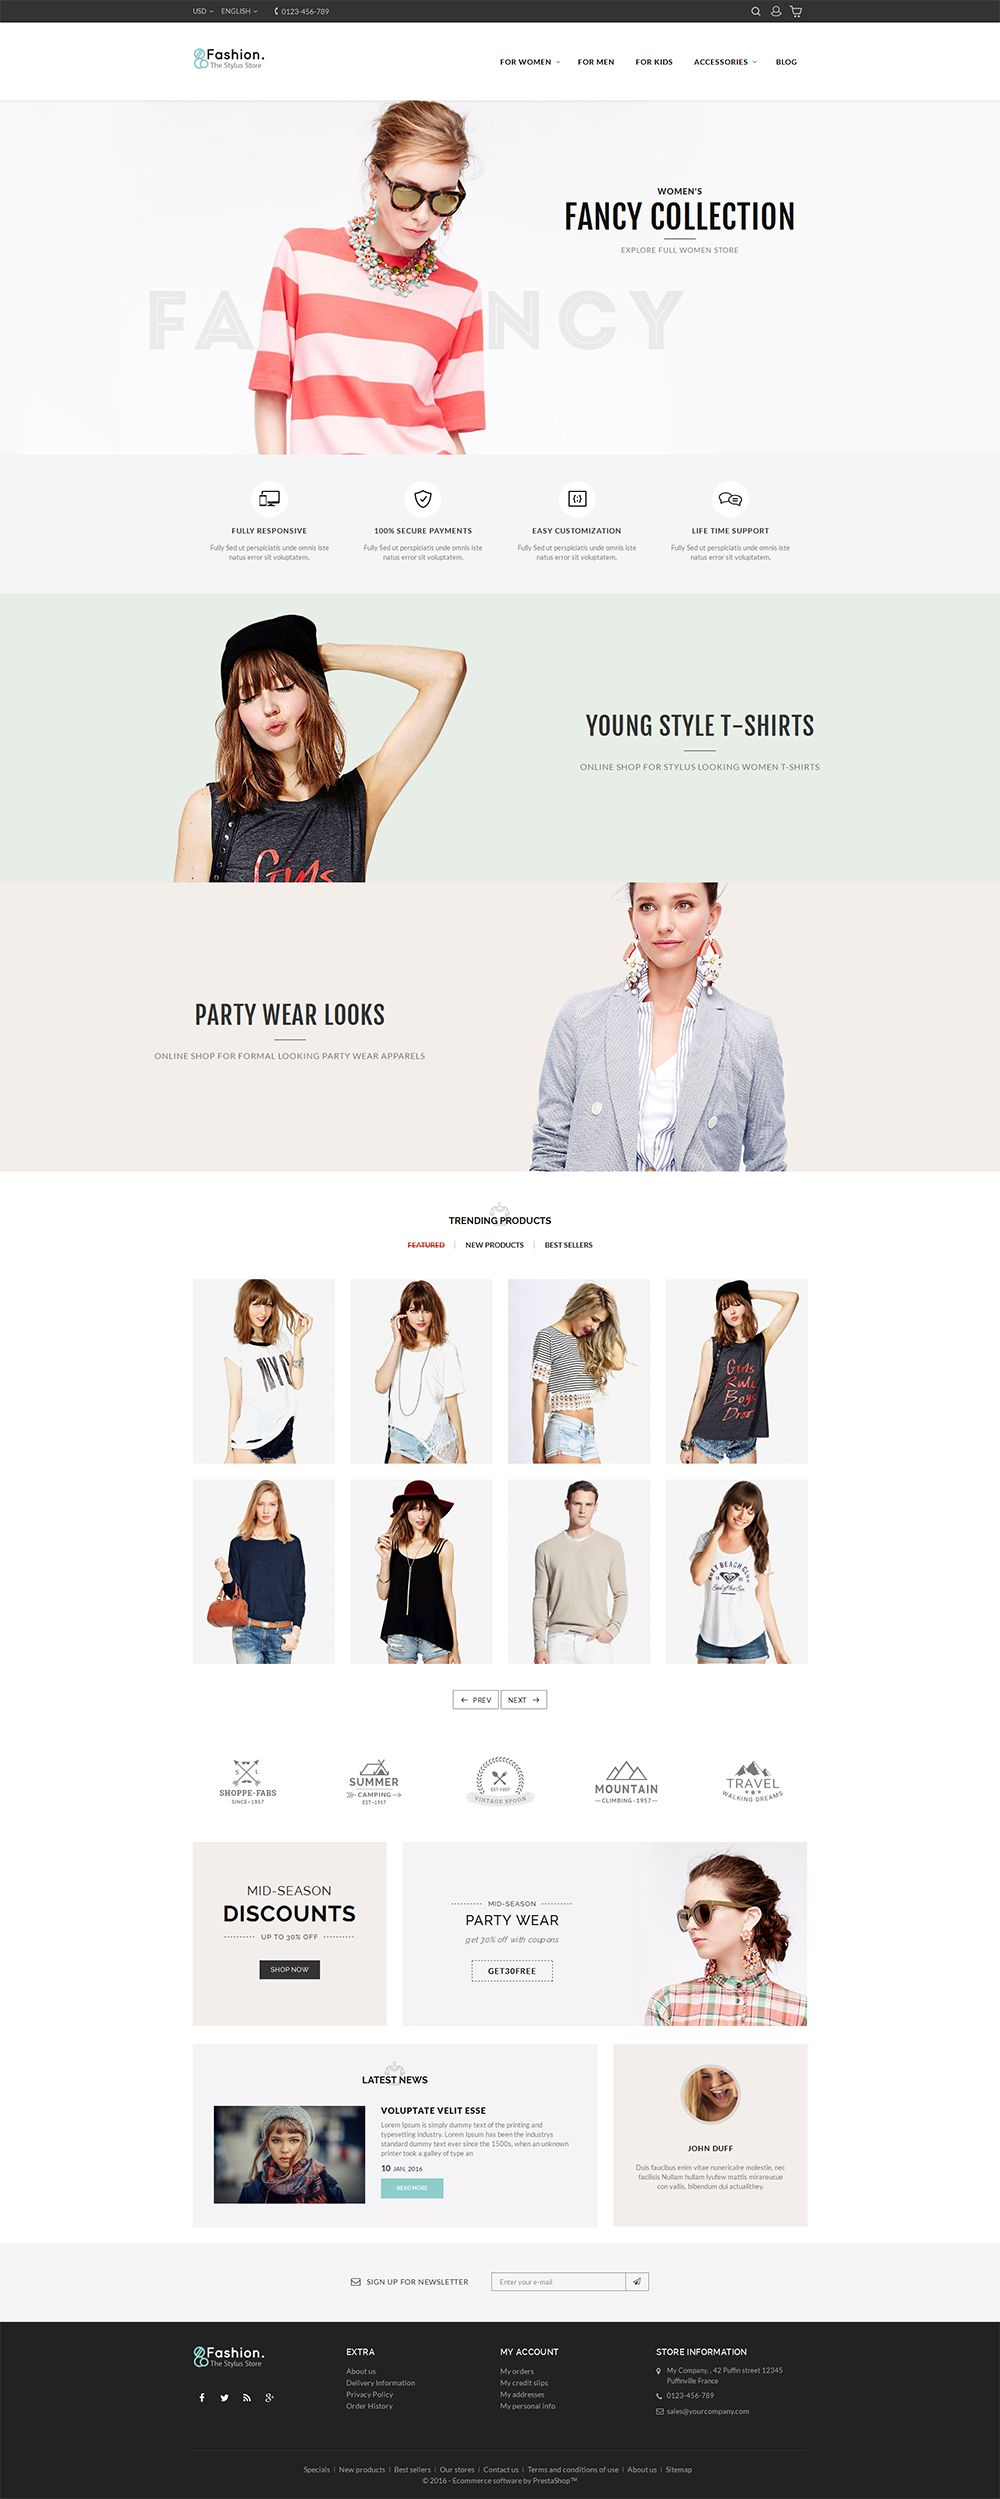 Fashion Store Ecommerce Web Design Web Design Tips Responsive Theme